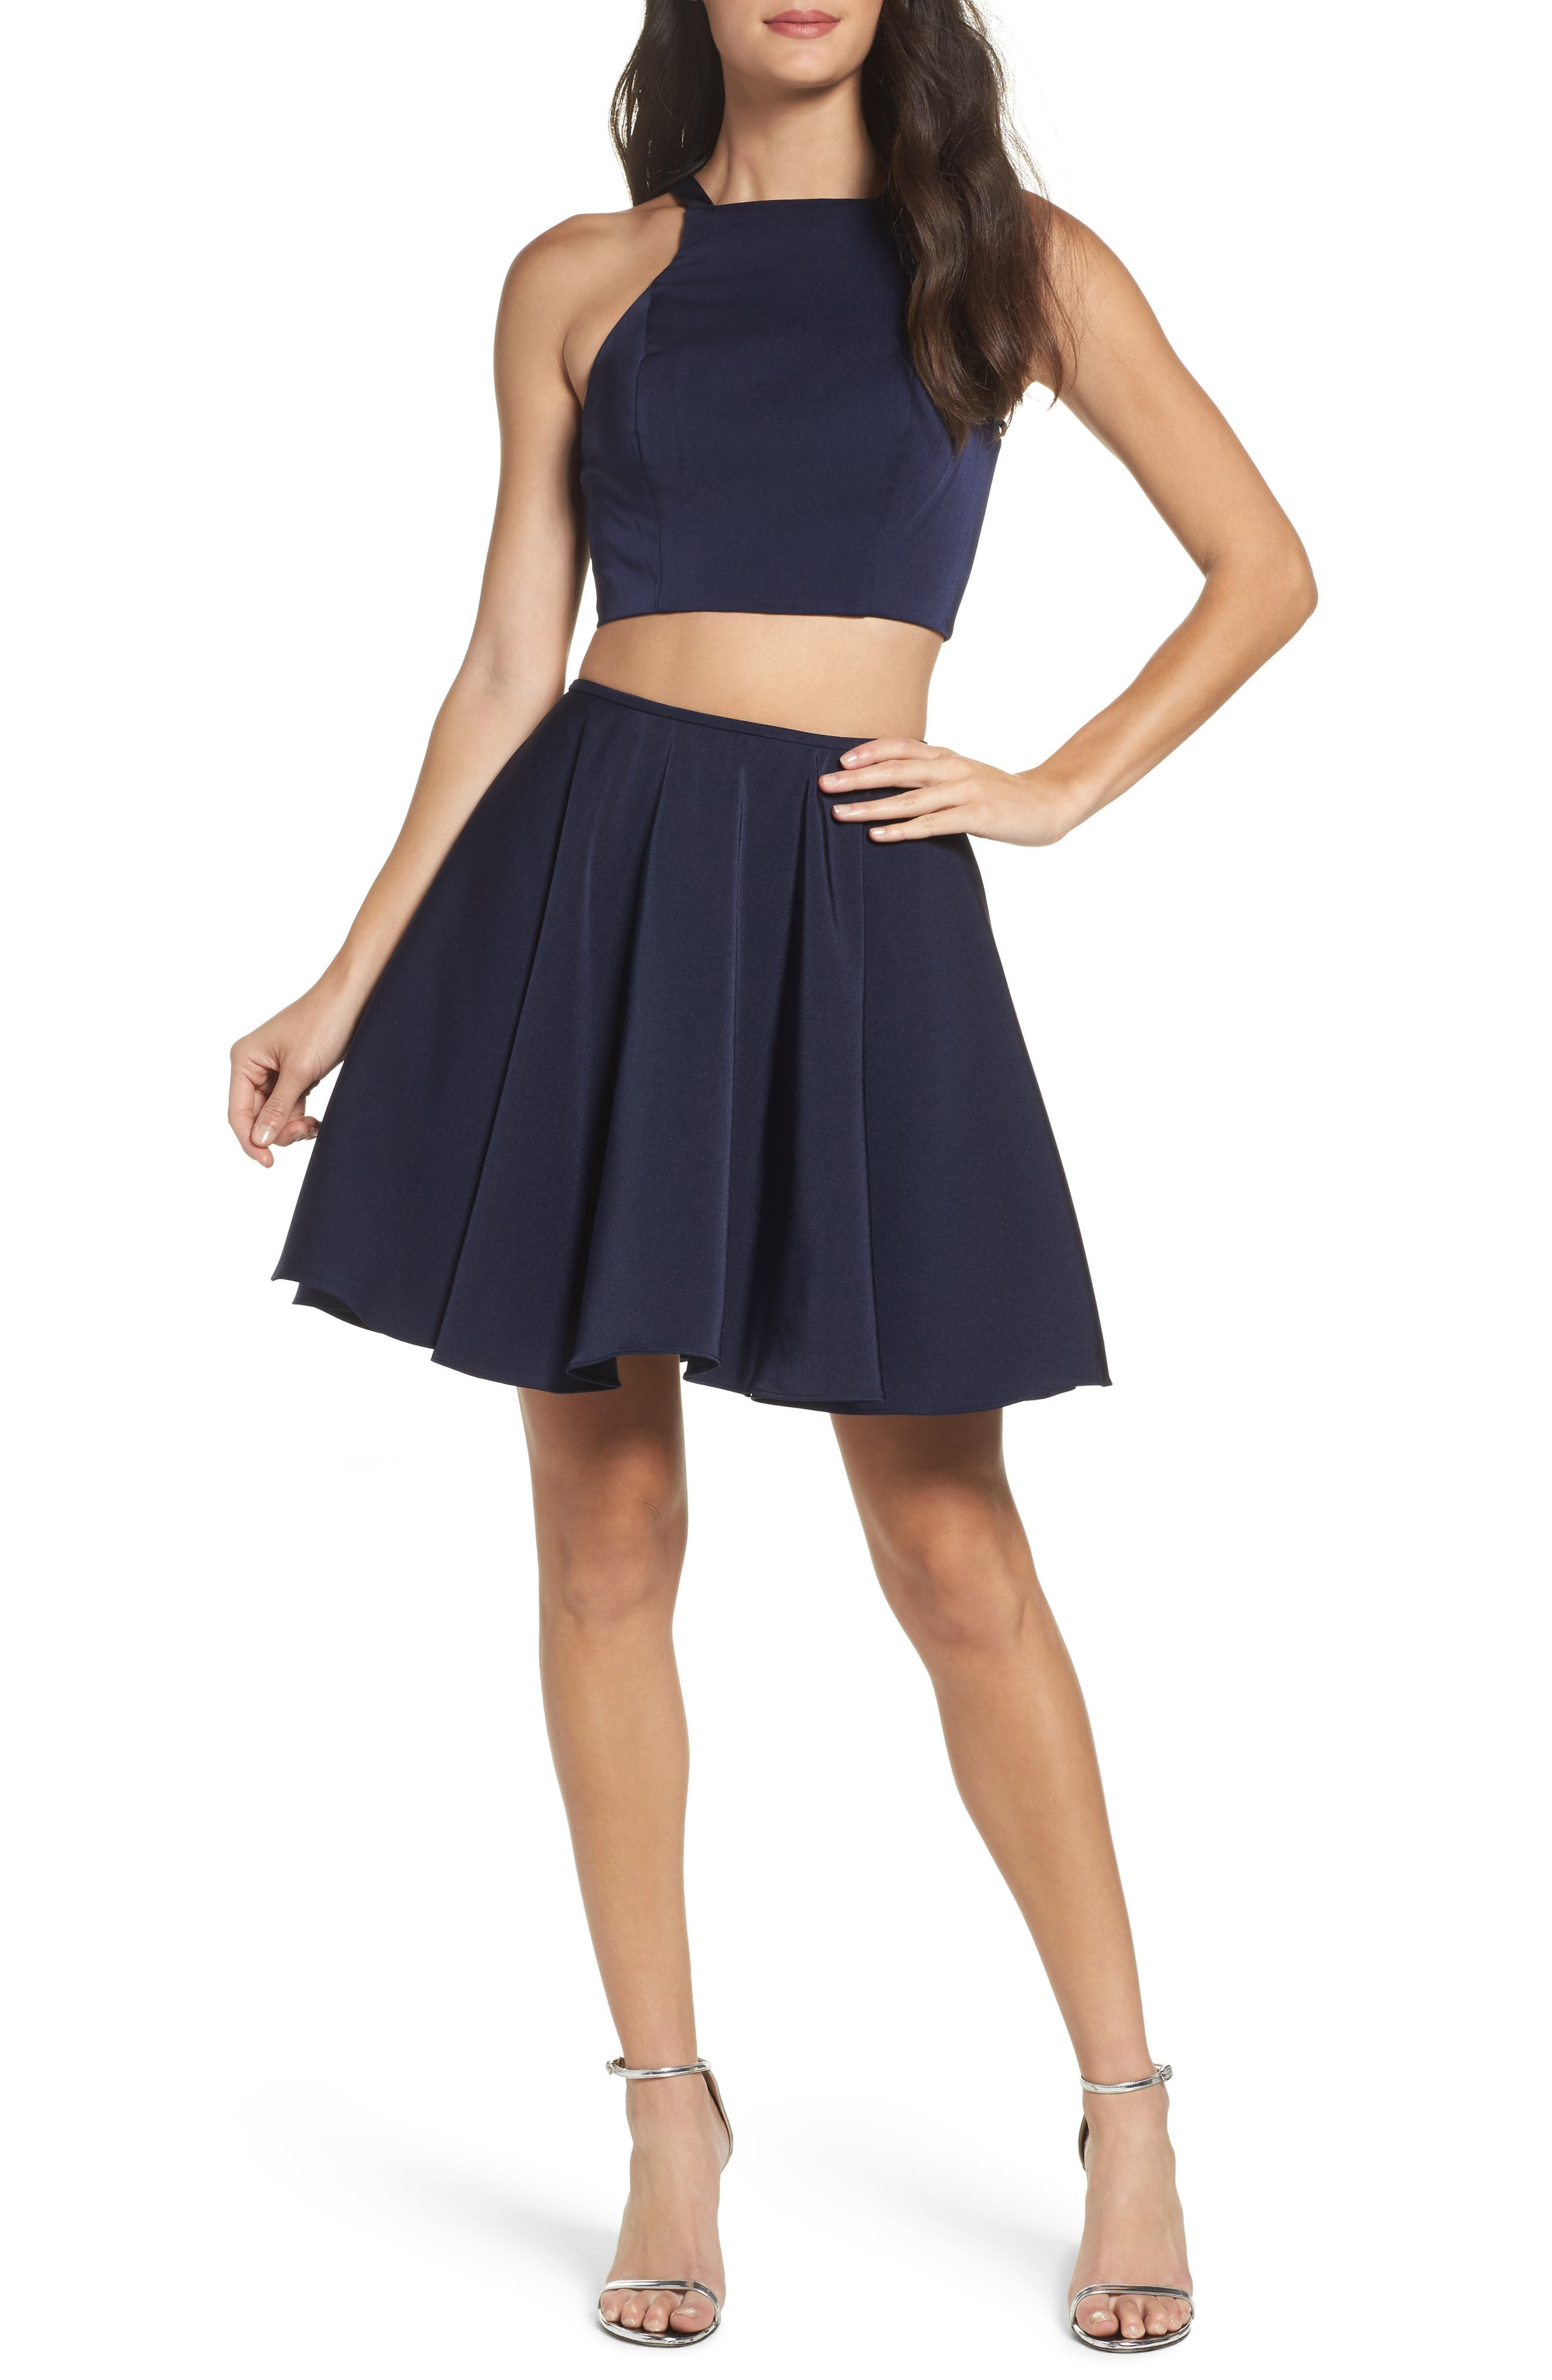 La Femme Strappy Back Two-Piece Skater Dress